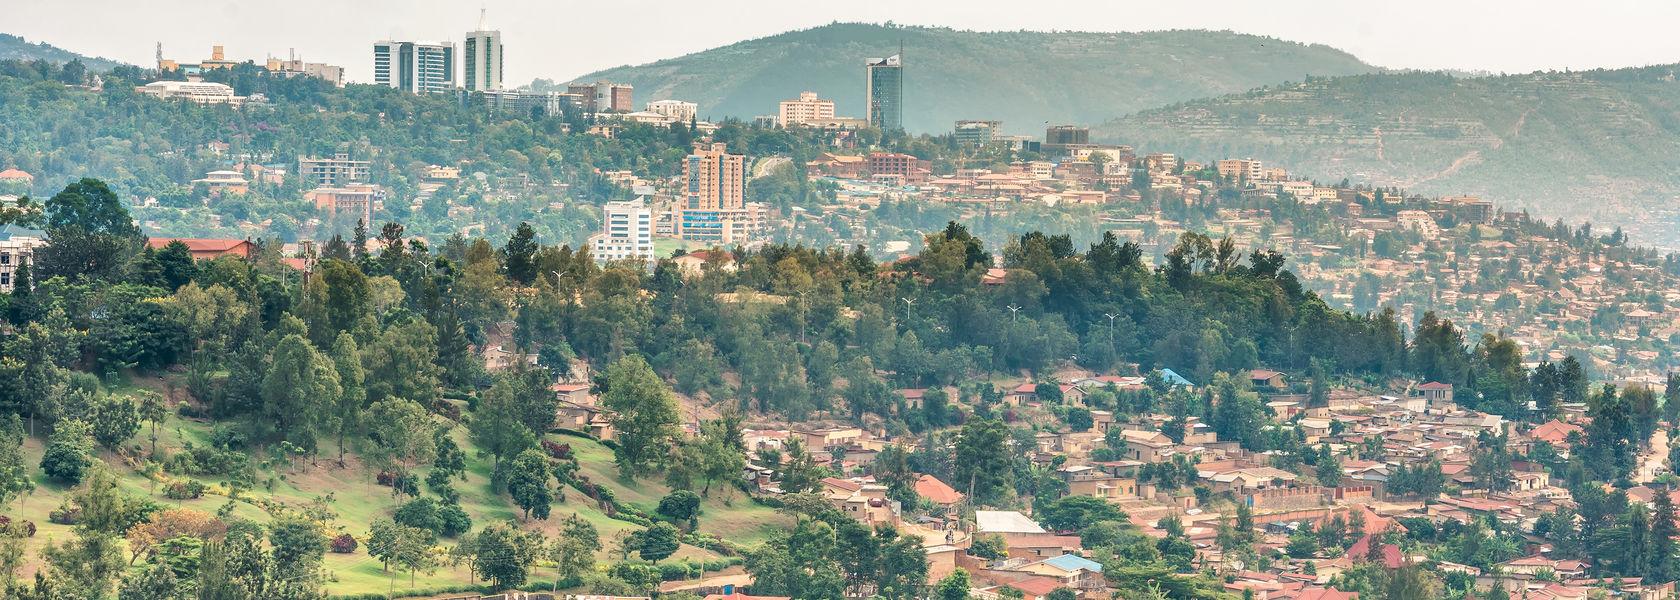 Genocide monument Kigali - Genocide Memorial Centre